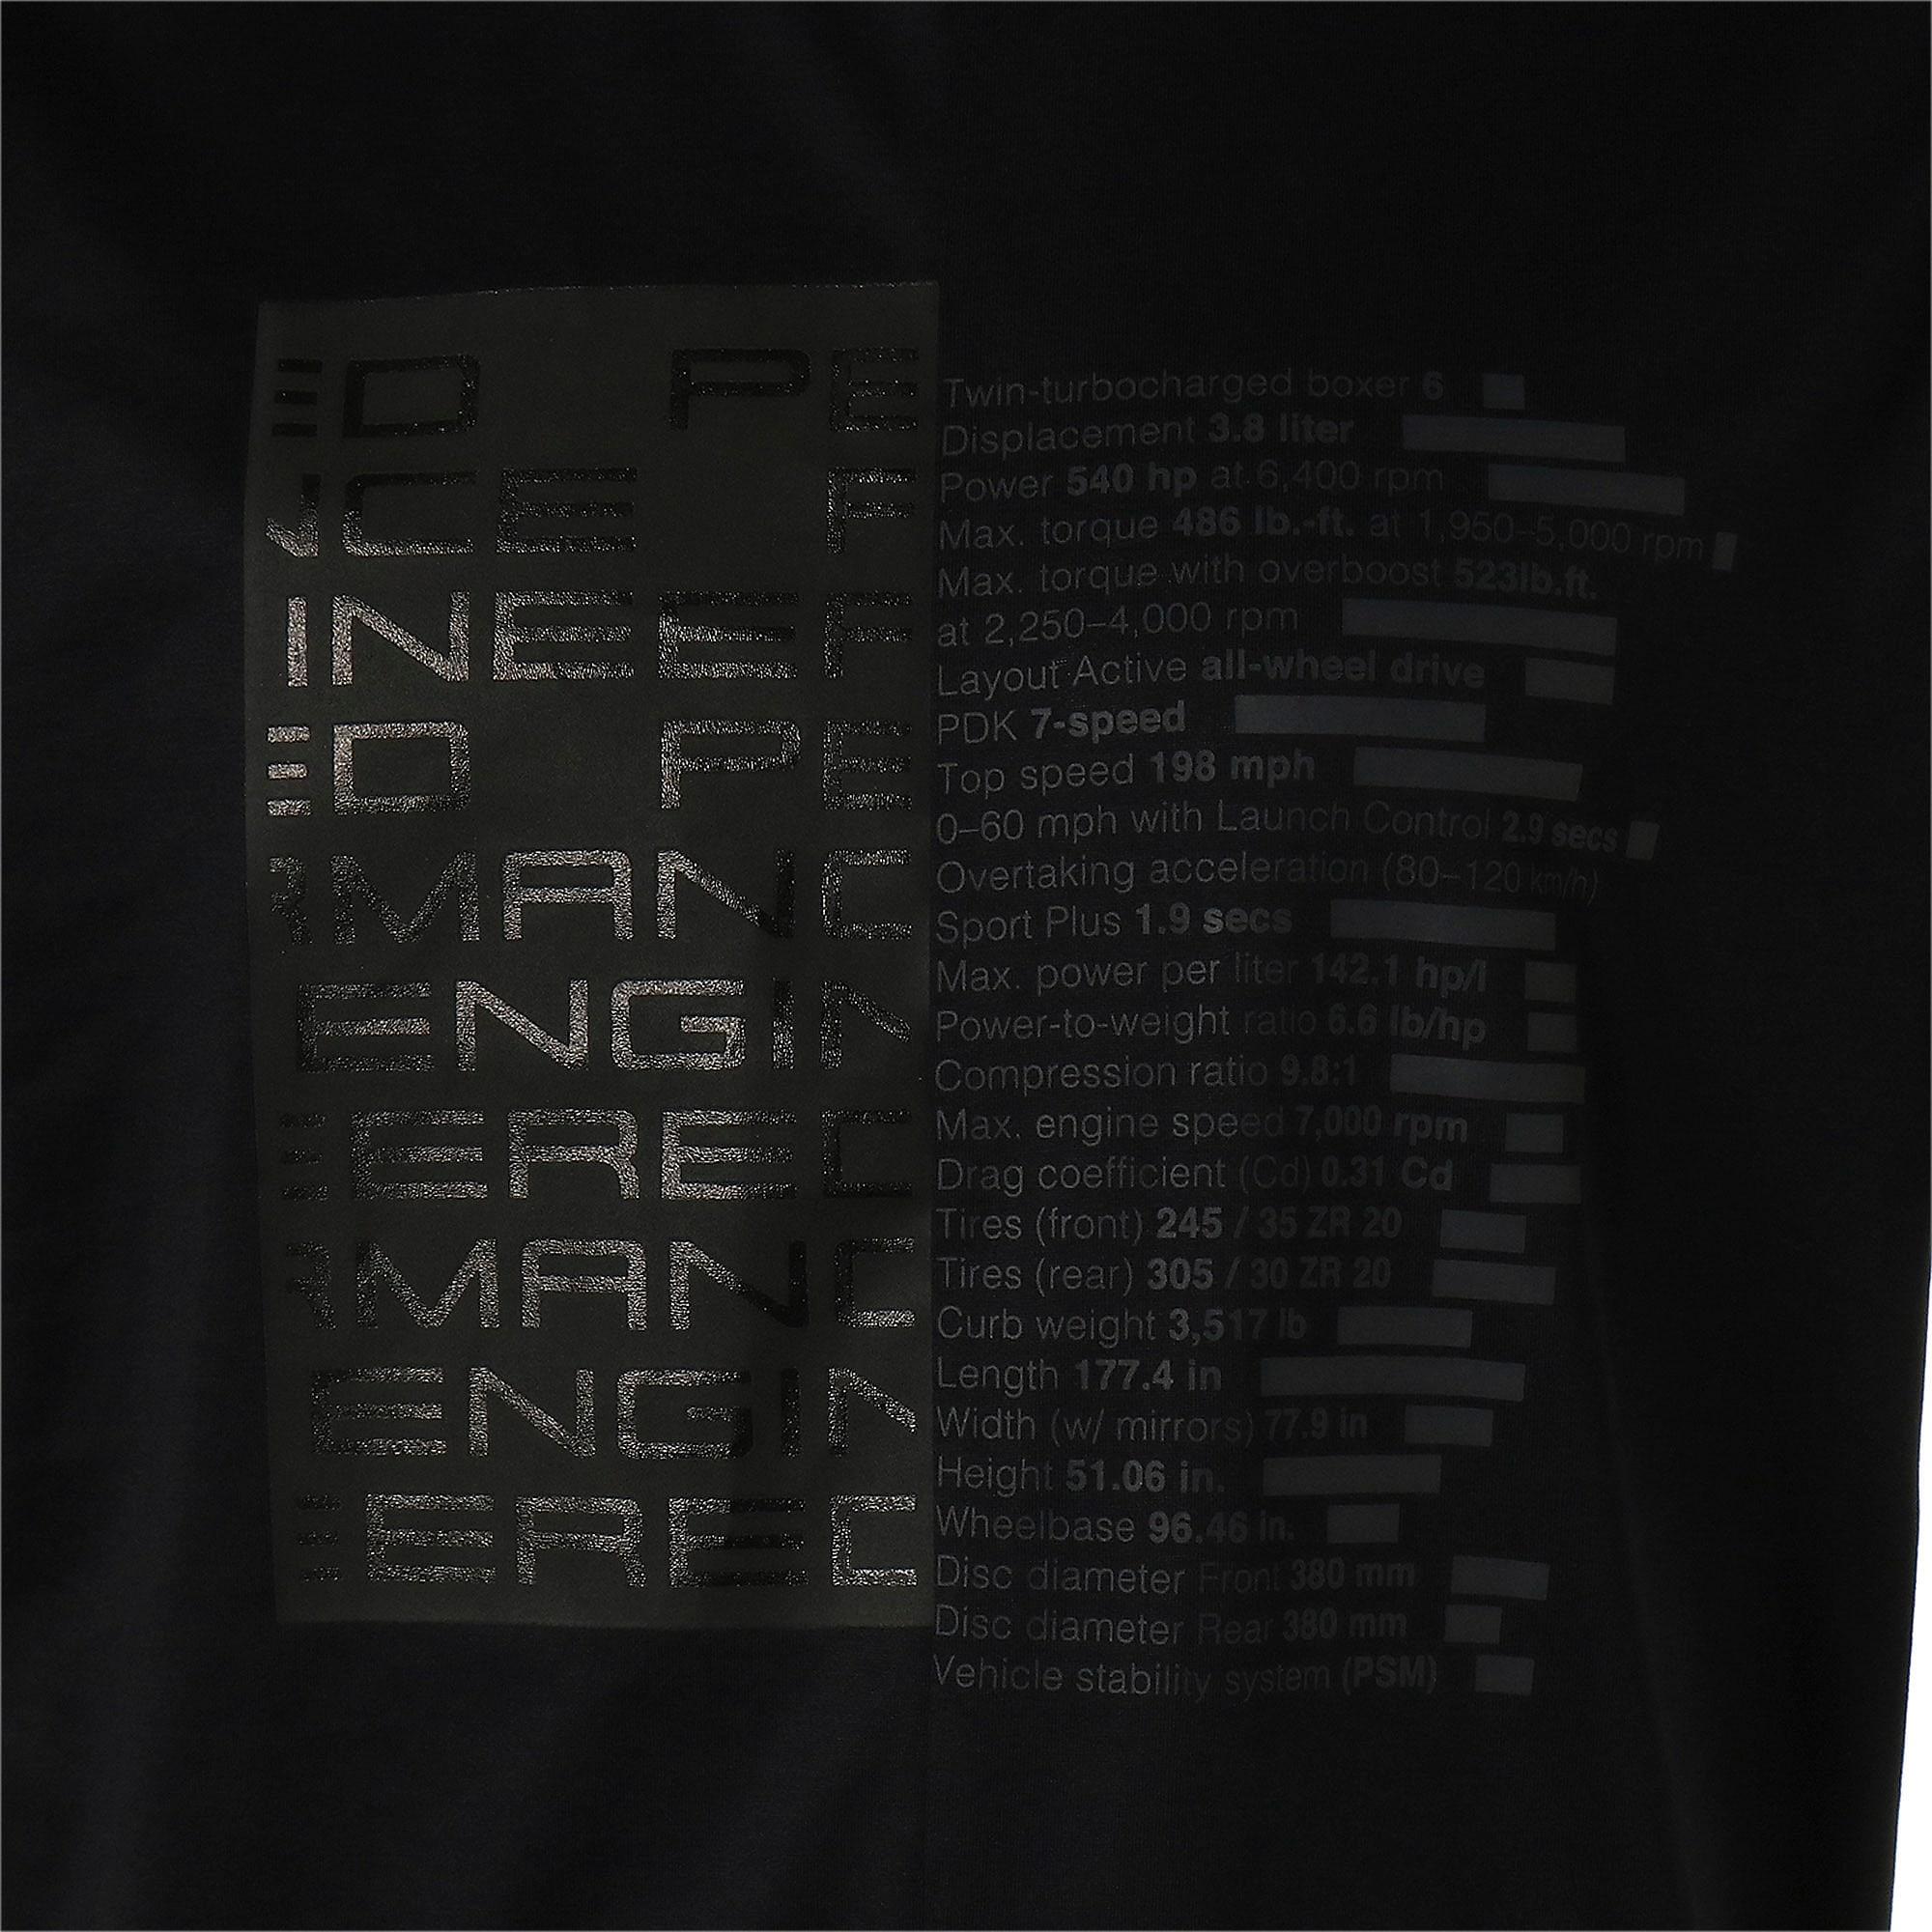 Thumbnail 7 of M ポルシェデザイン PD グラフィック Tシャツ, Jet Black, medium-JPN